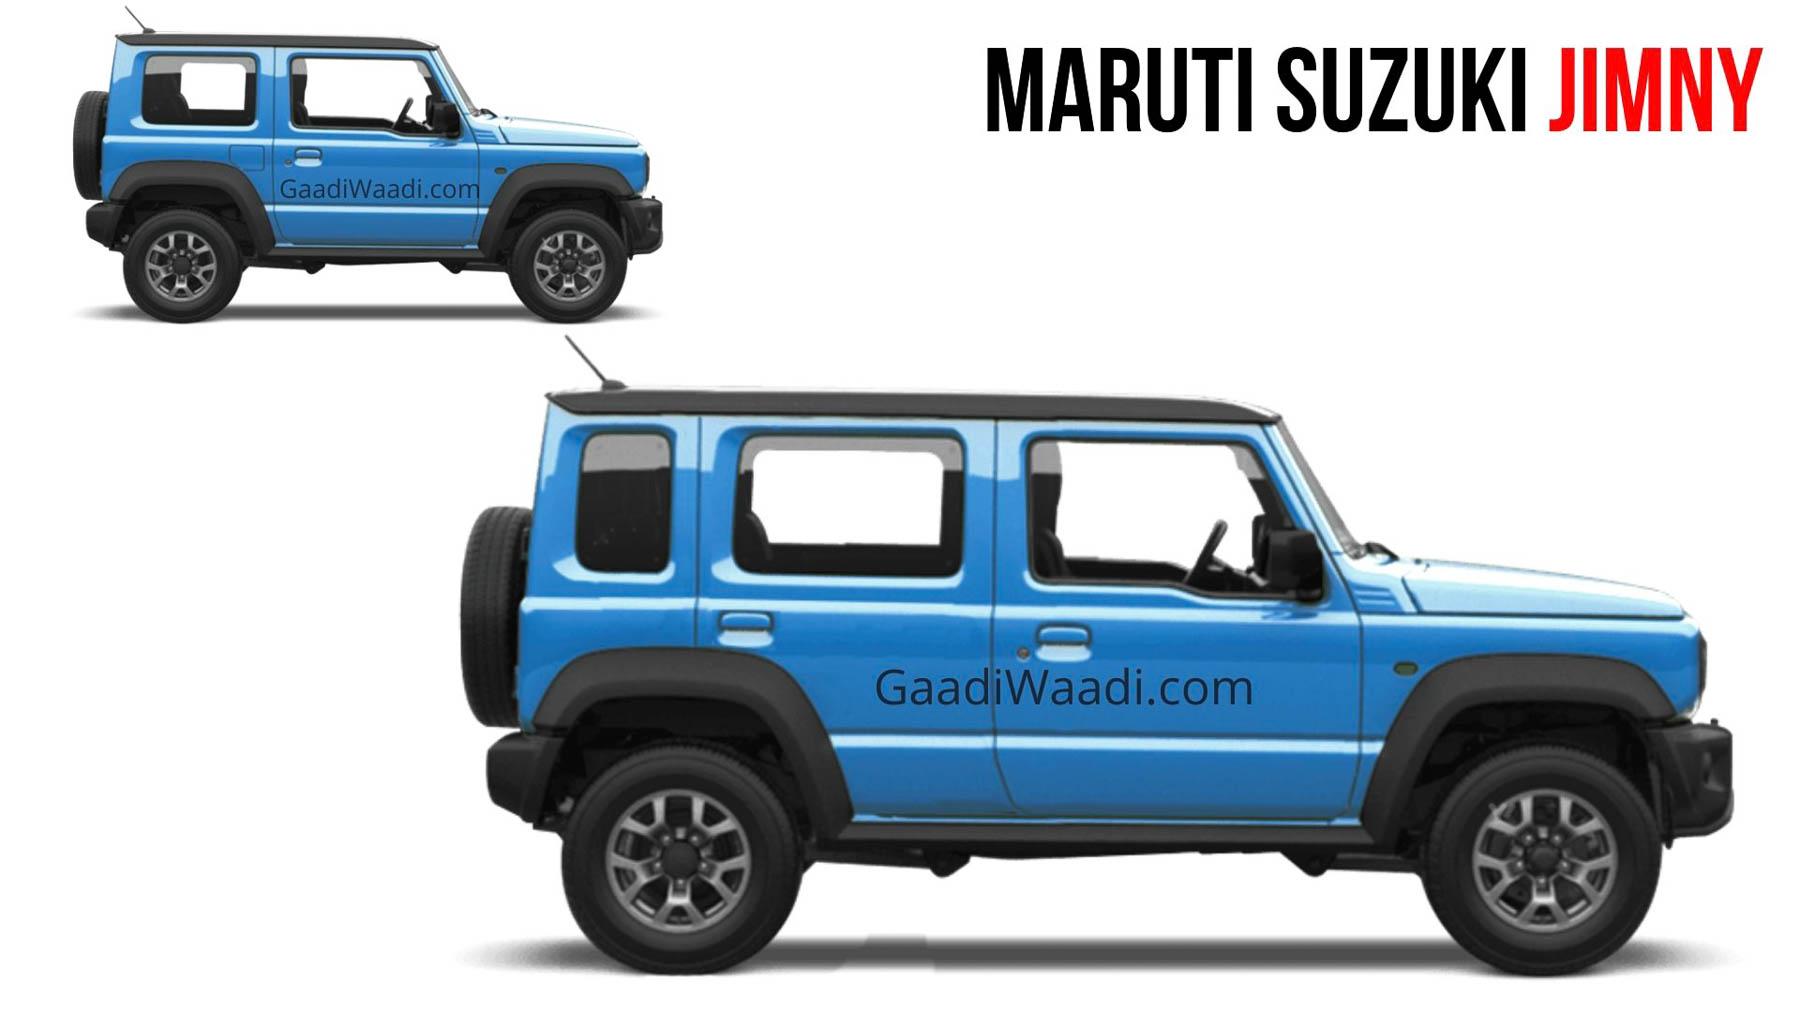 Maruti Suzuki Is Still Unsure About Launching The Jimny SUV In India